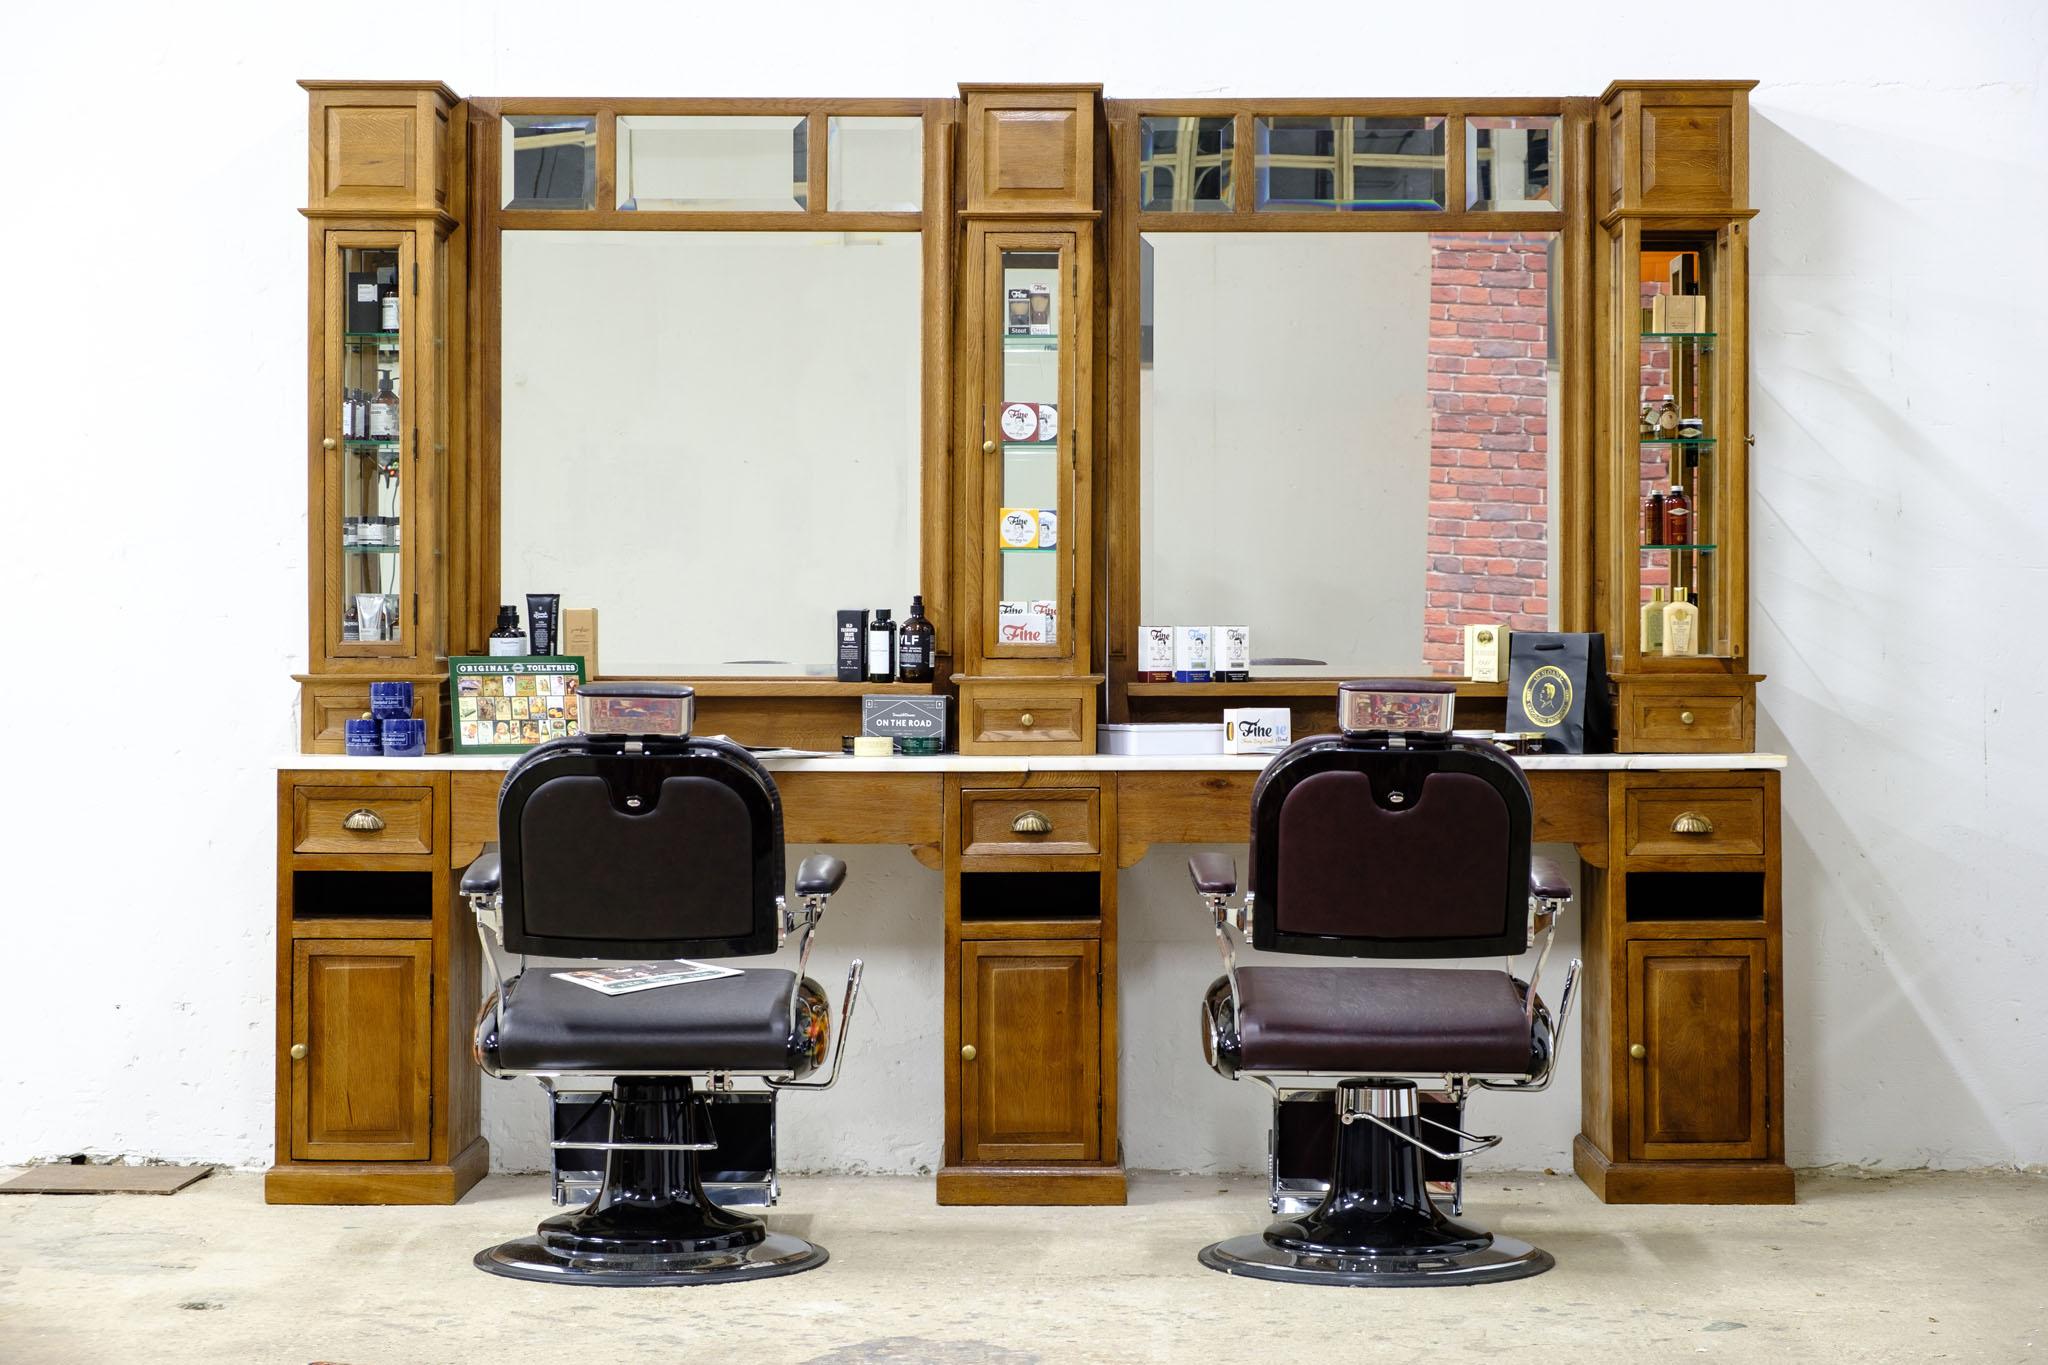 Barberunit   Barberfurniture   Barbershop interior   Worldwide delivery   Classic barberstations